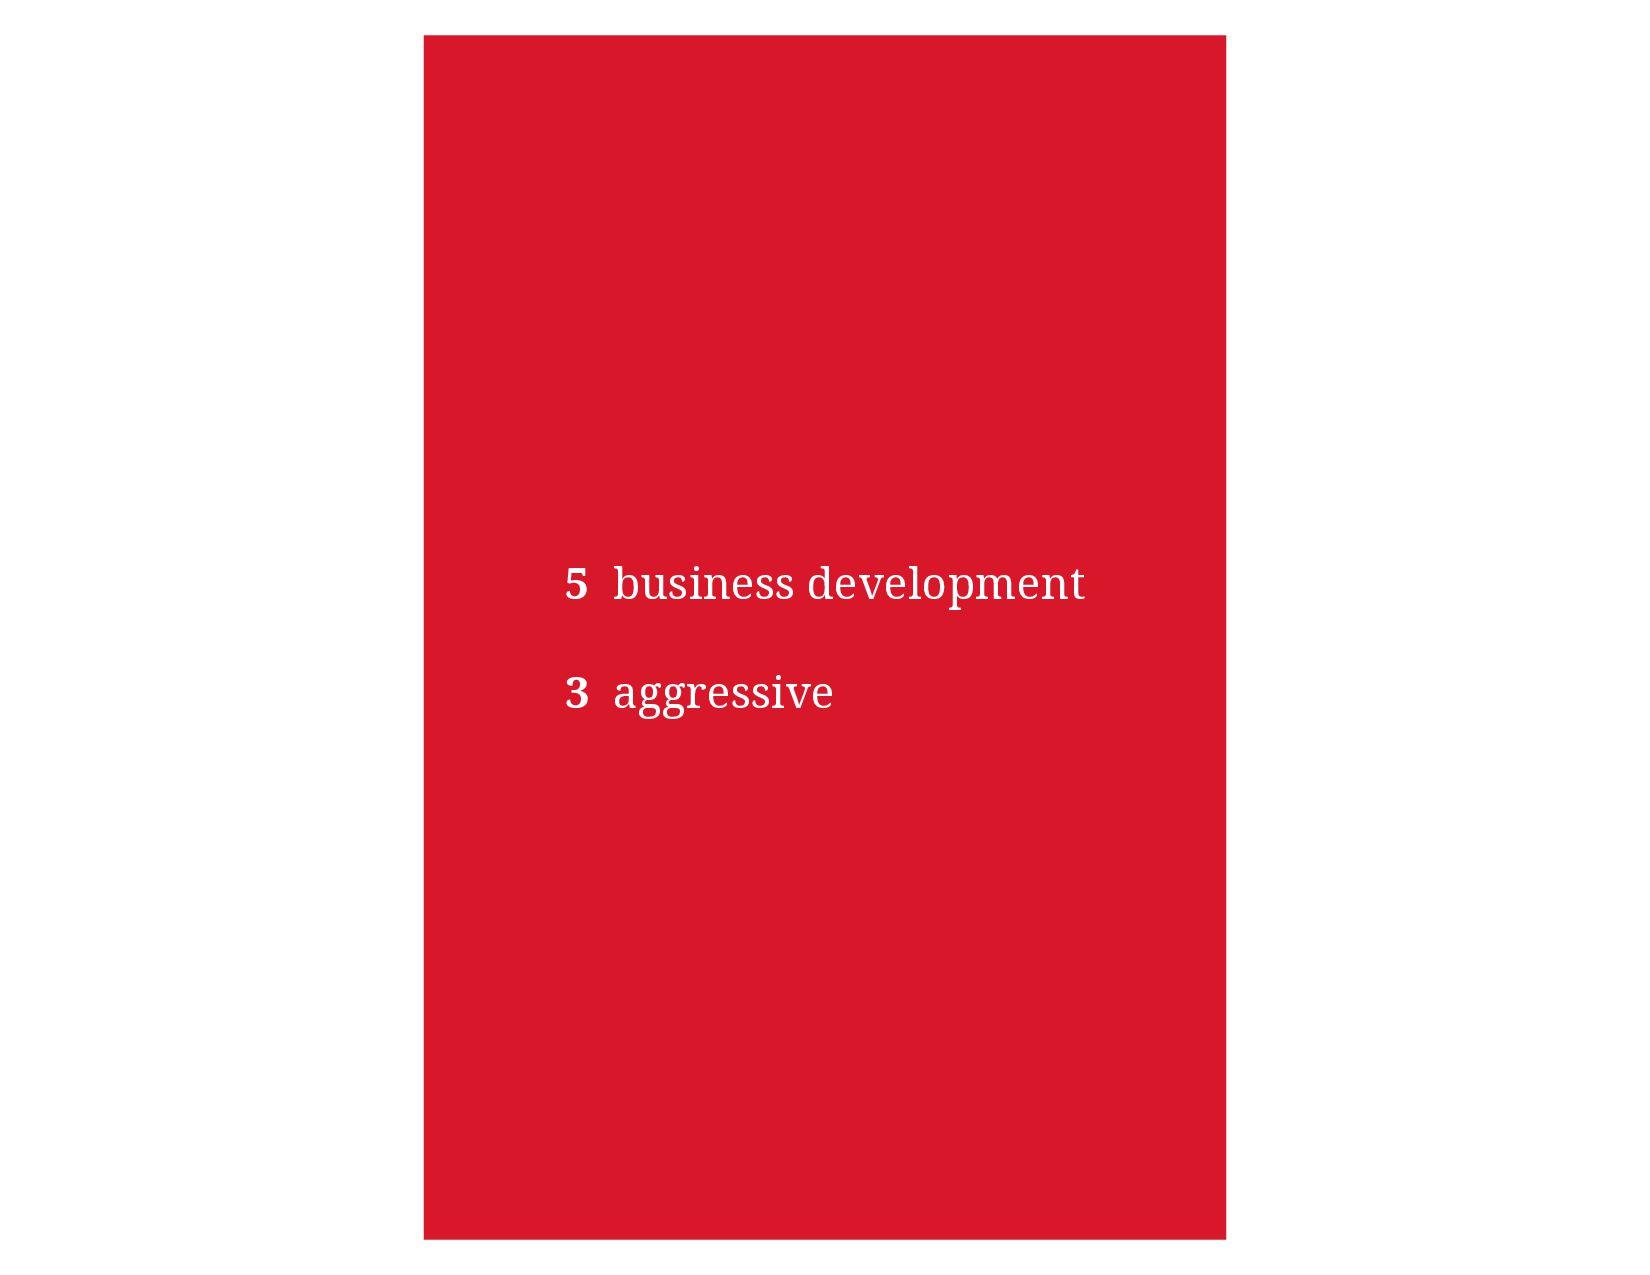 5 business development 3 aggressive